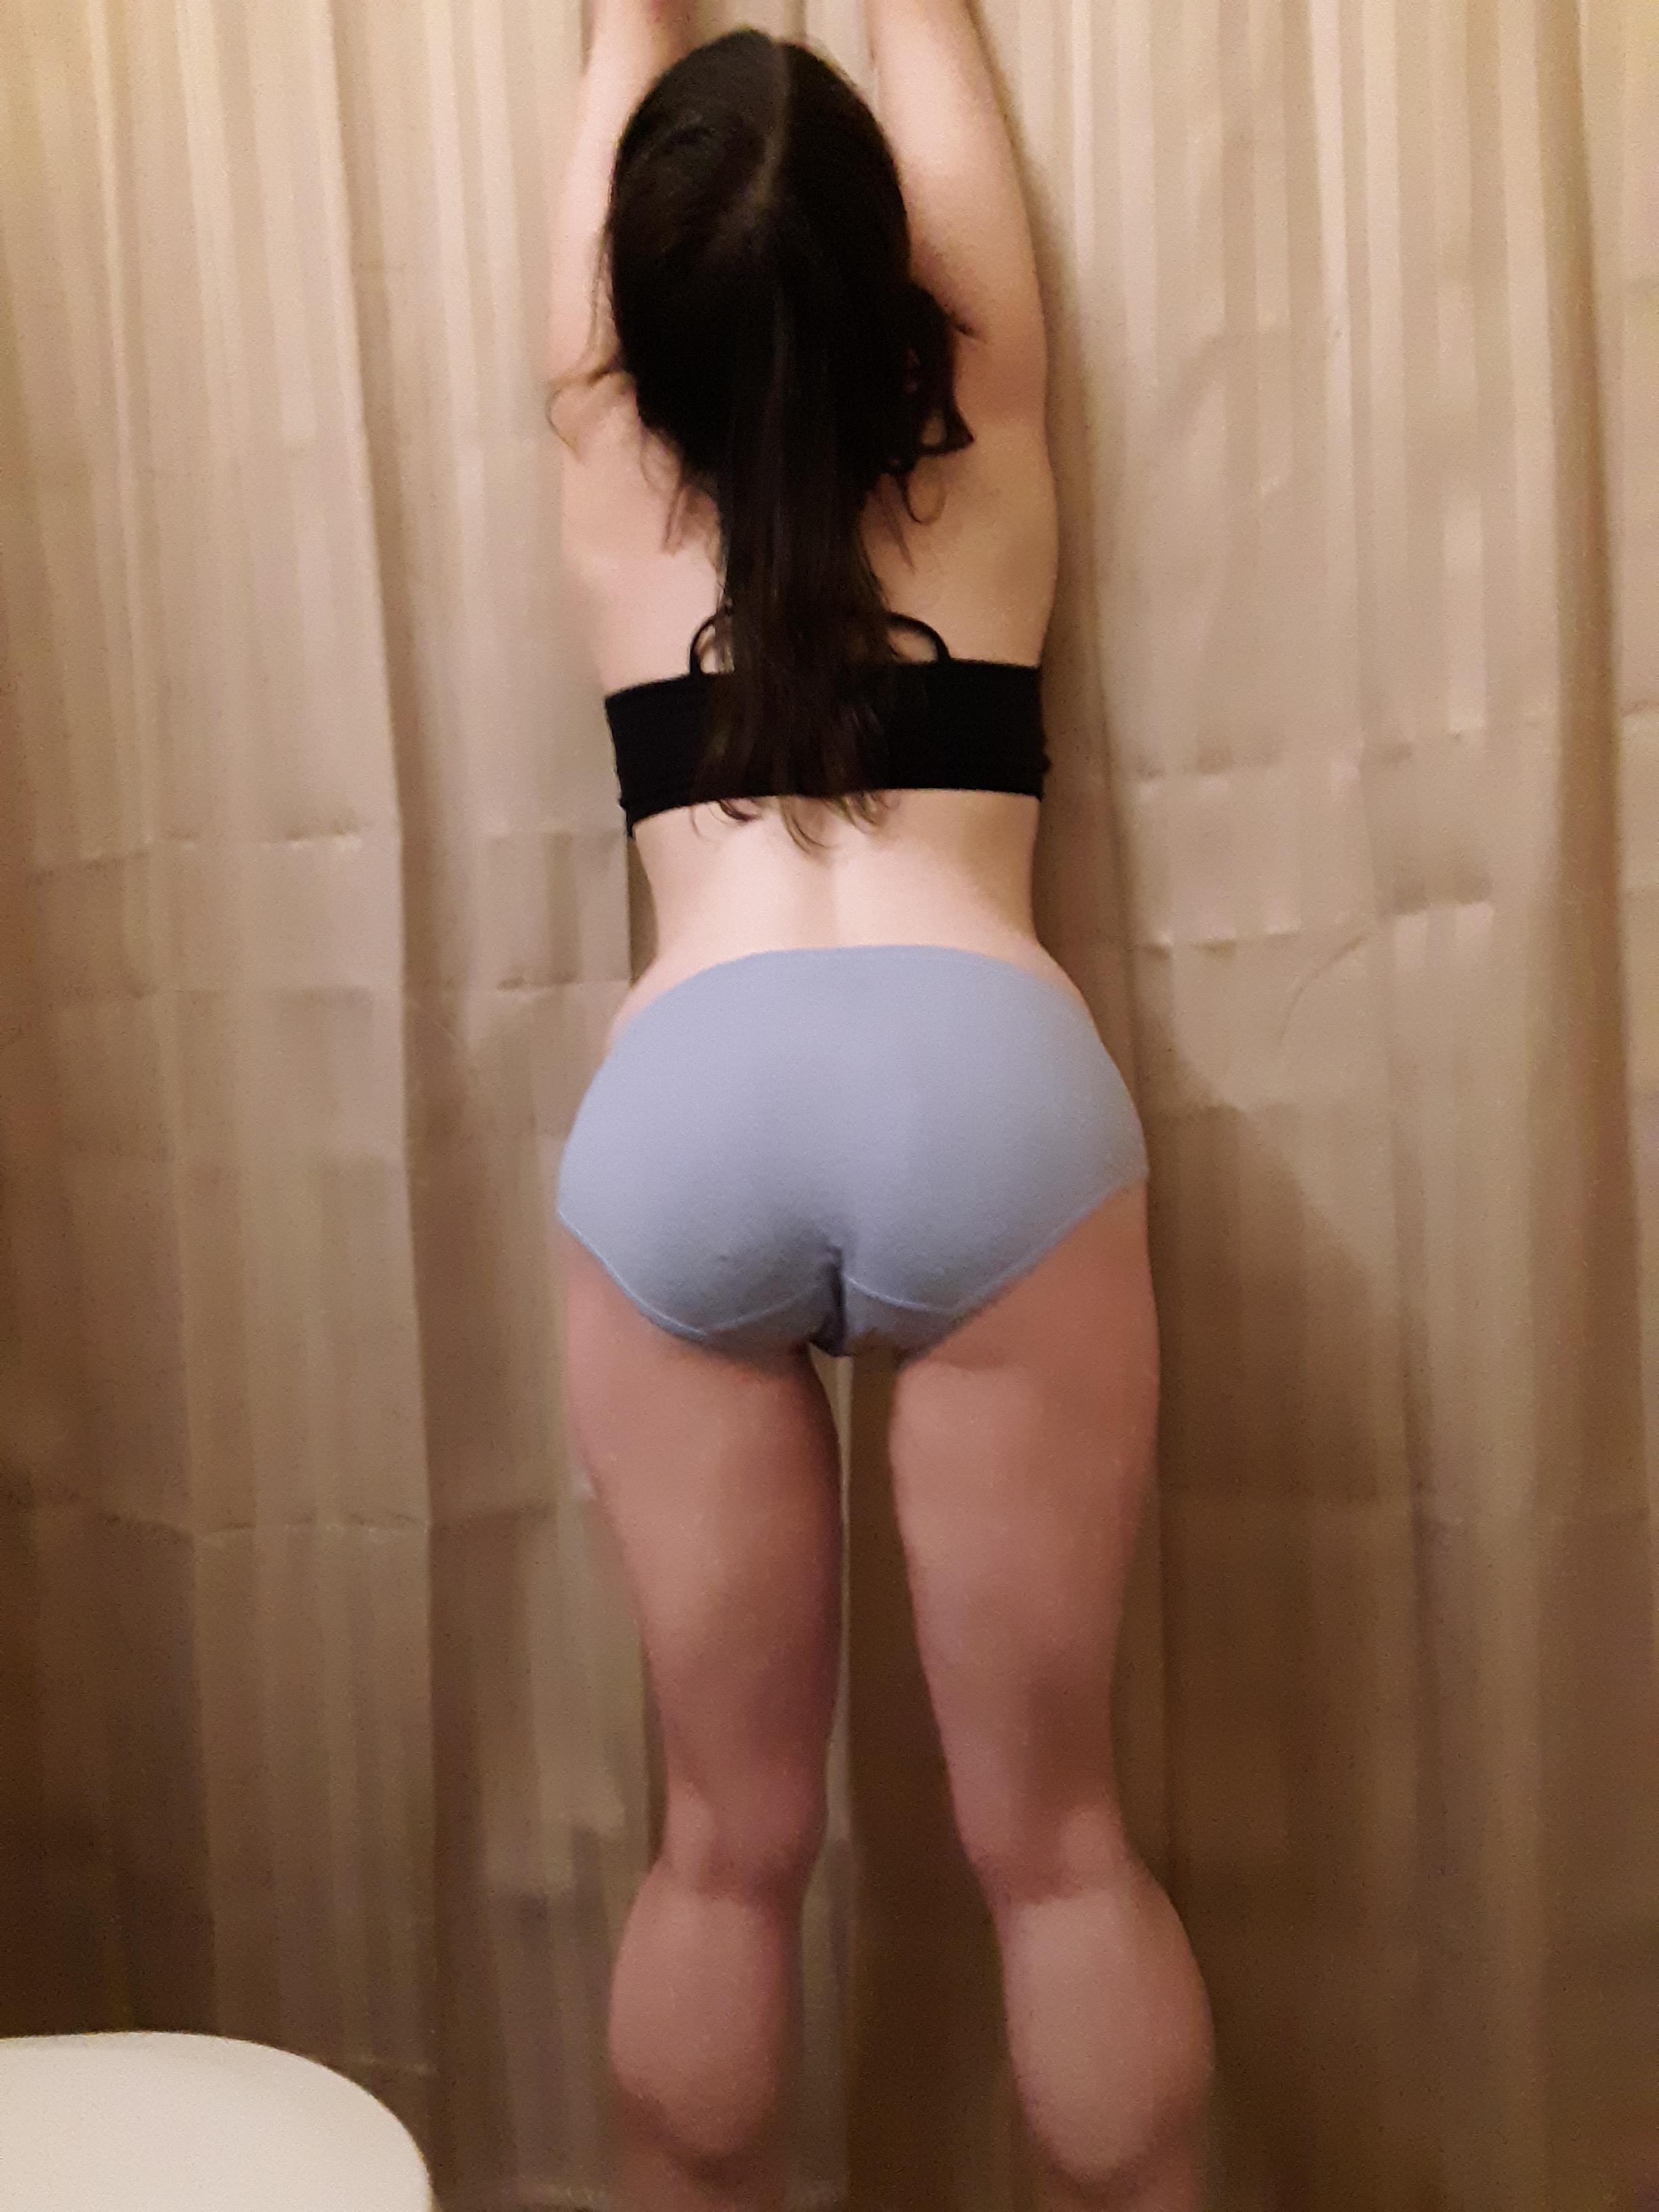 Two Girls One Guy Webcam